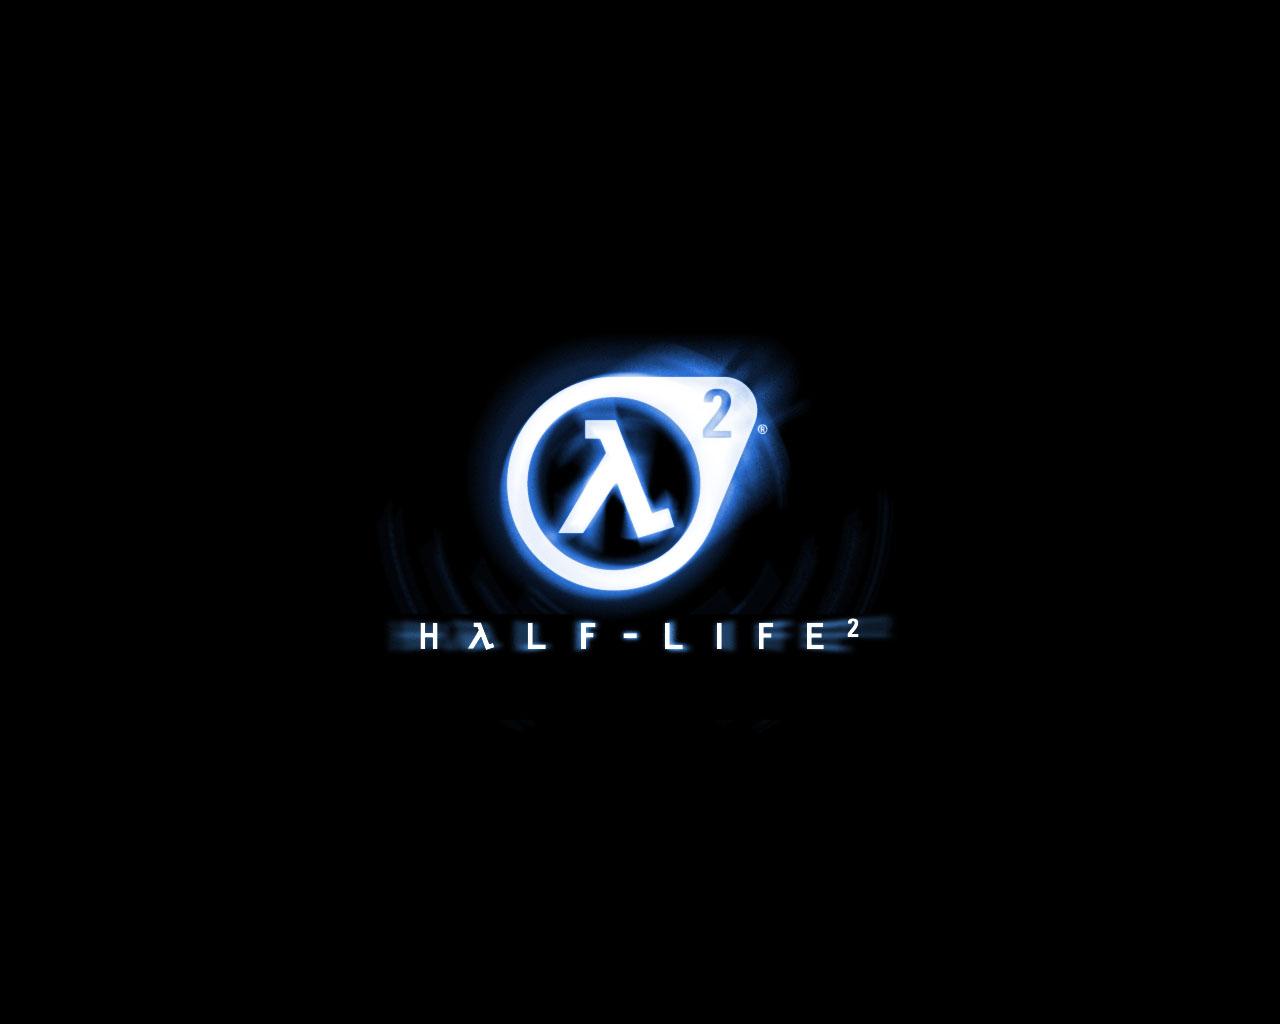 Half Life 2 Wallpapers2